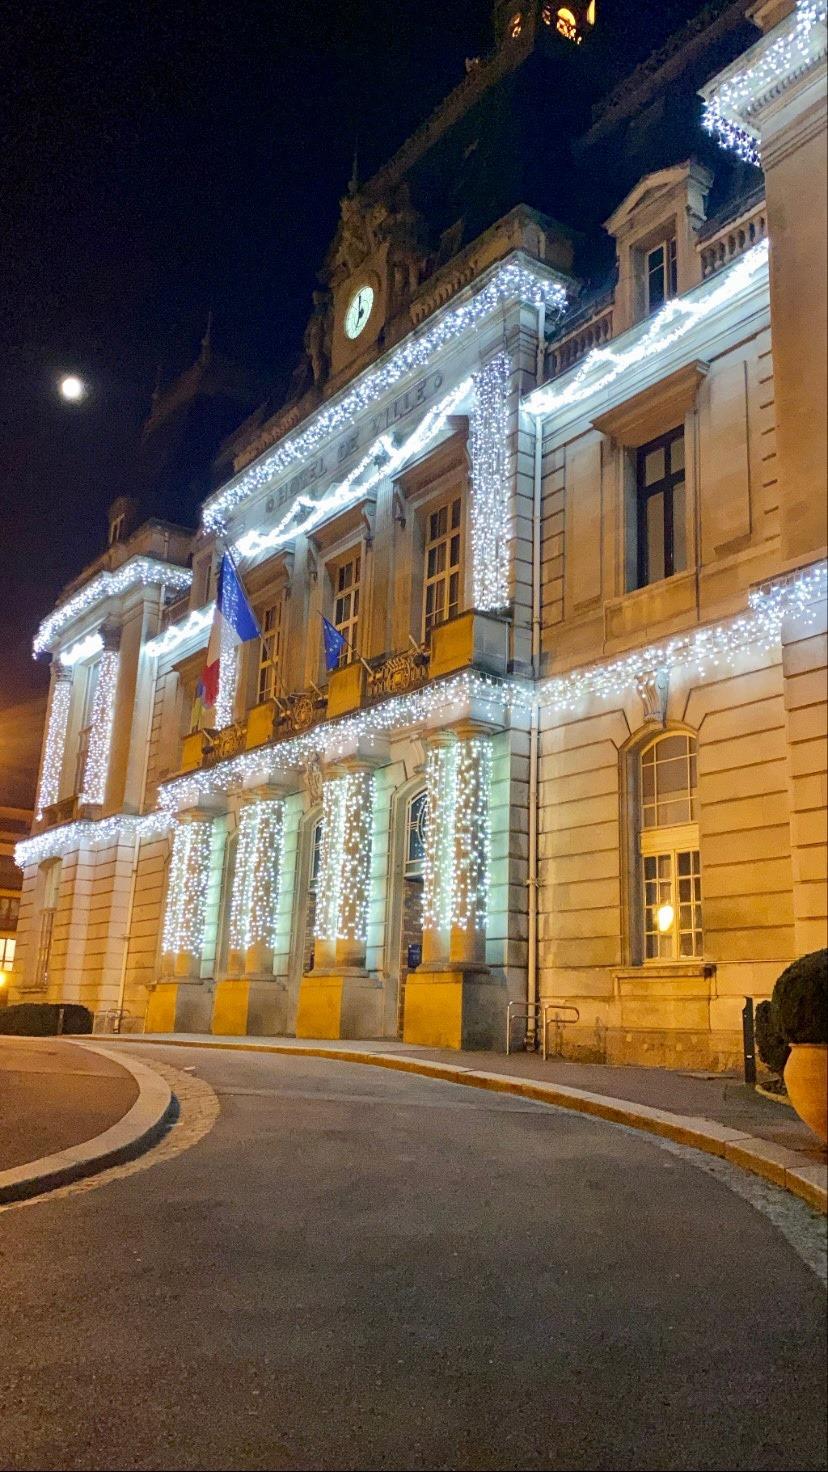 Noël approche à Saint-Maur !